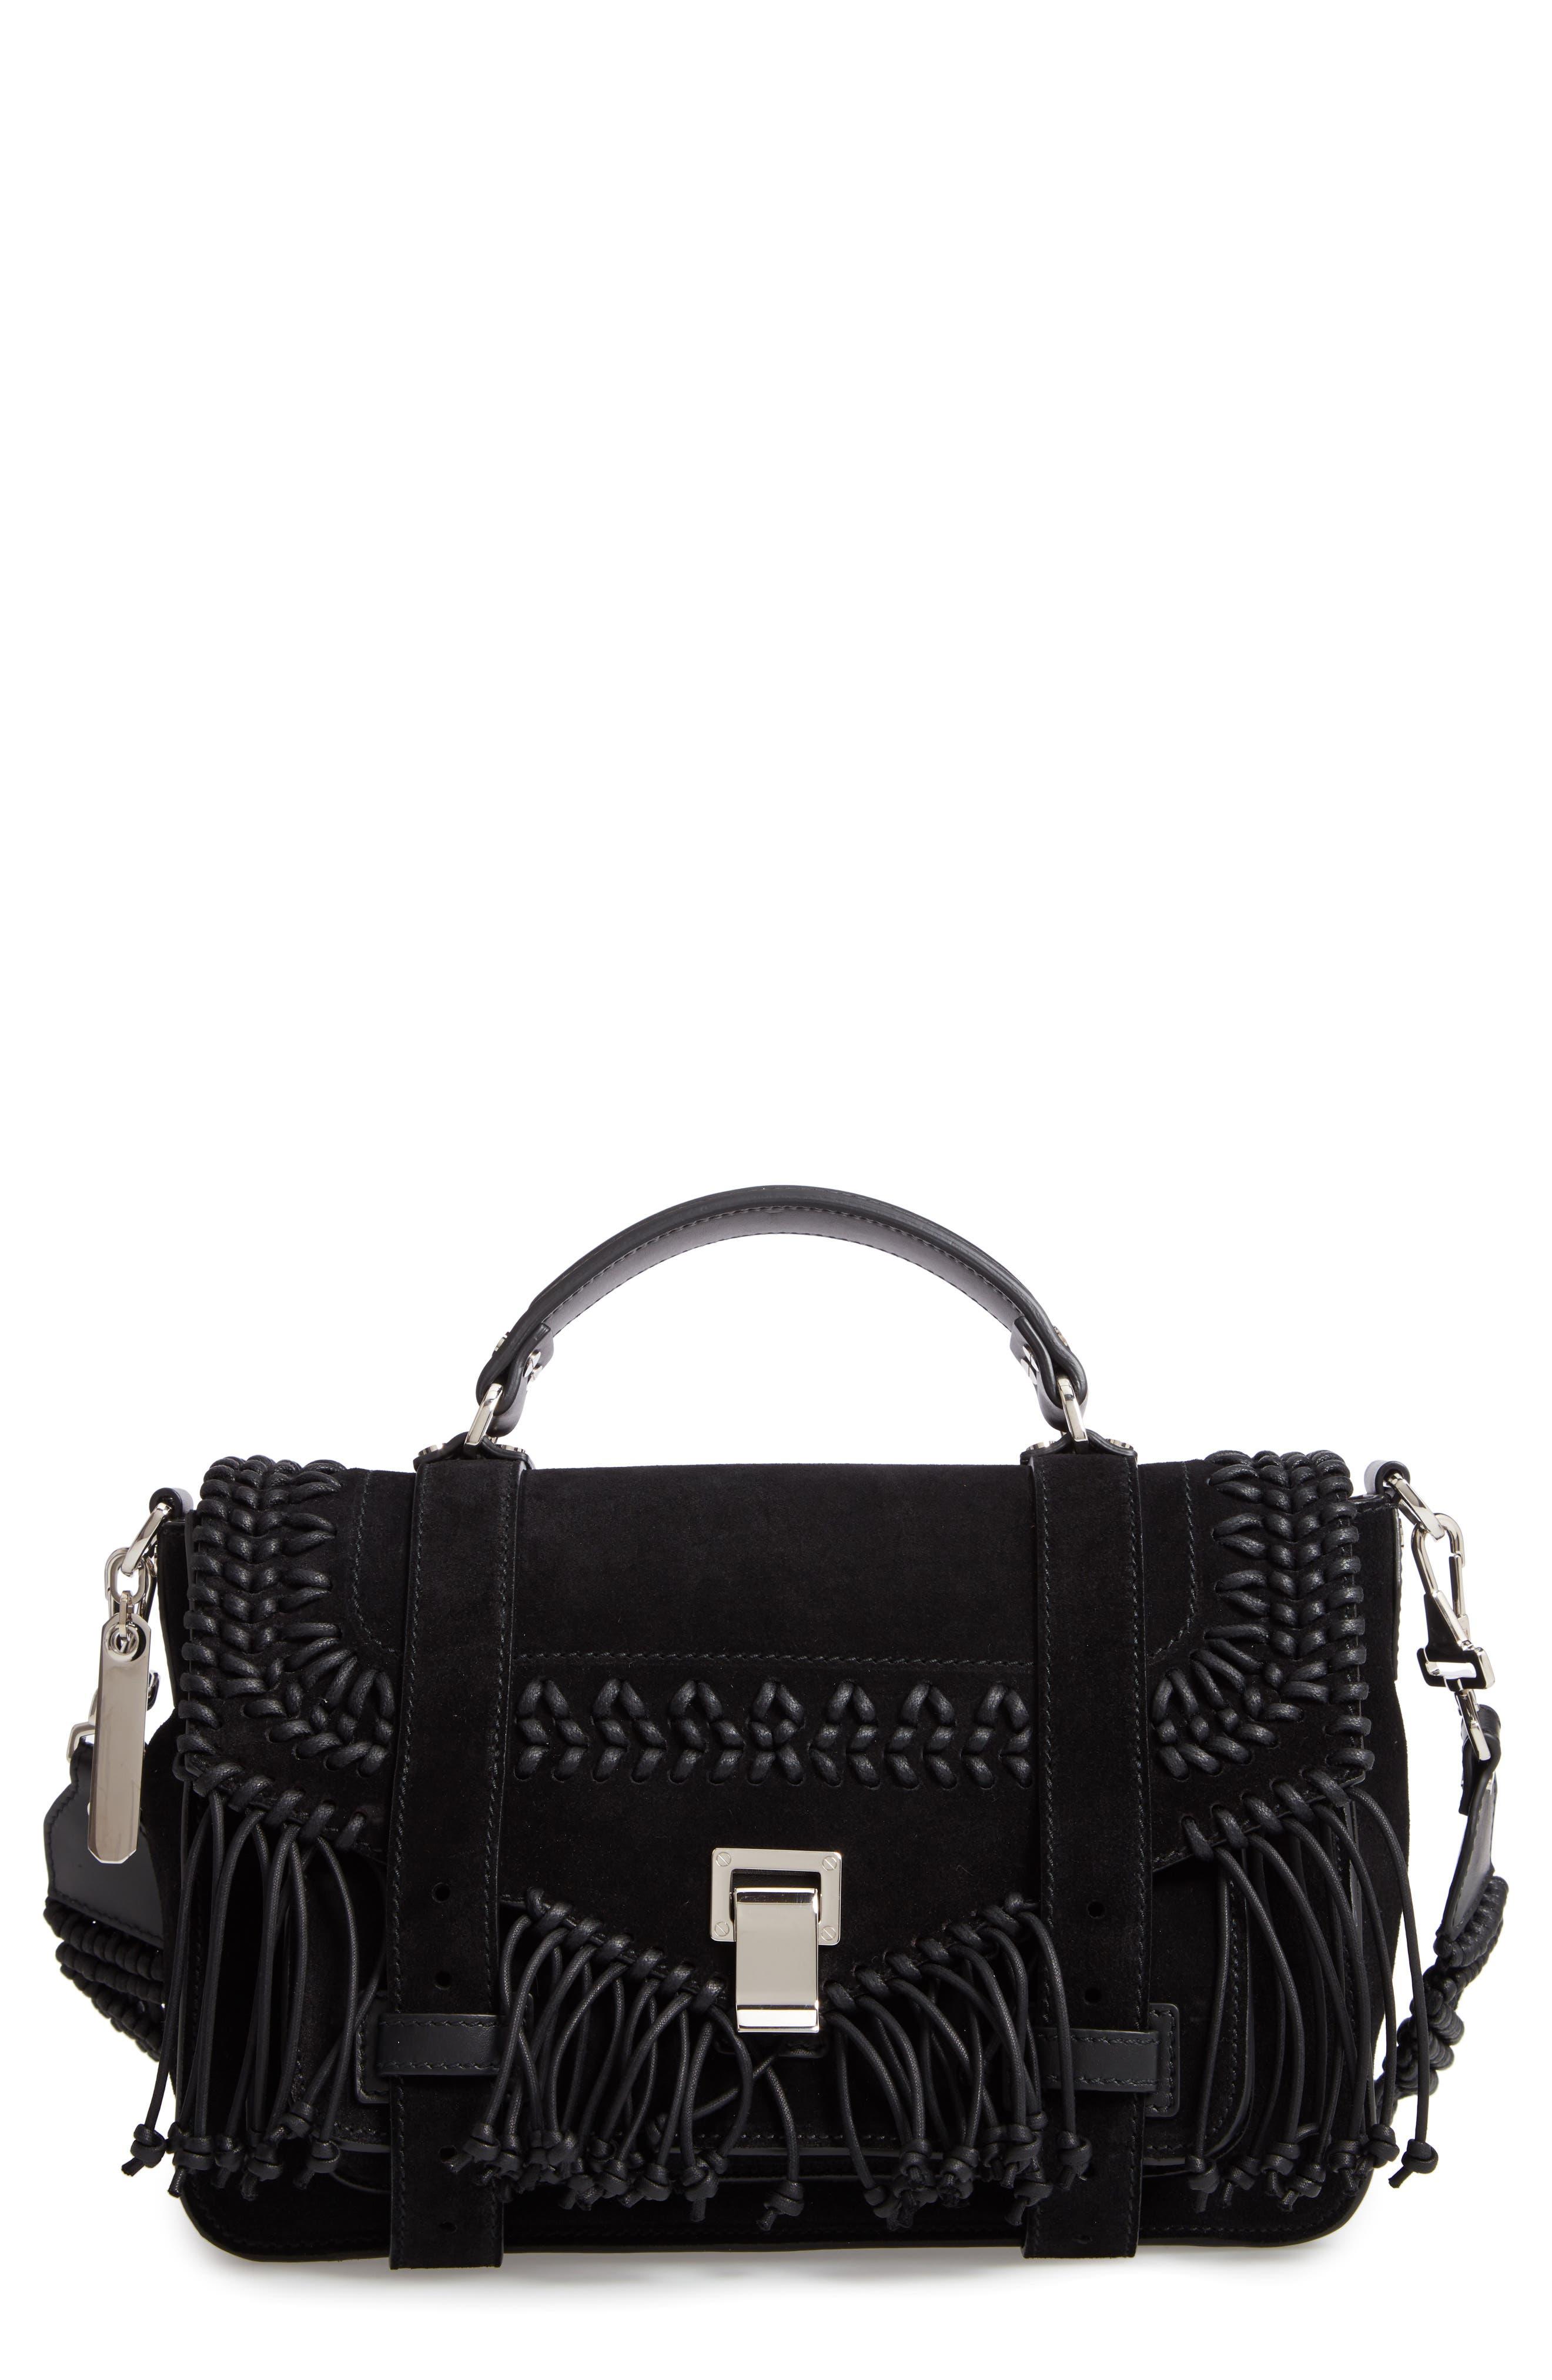 Ps1+ Medium Metallic Paper Leather Satchel Bag in Black